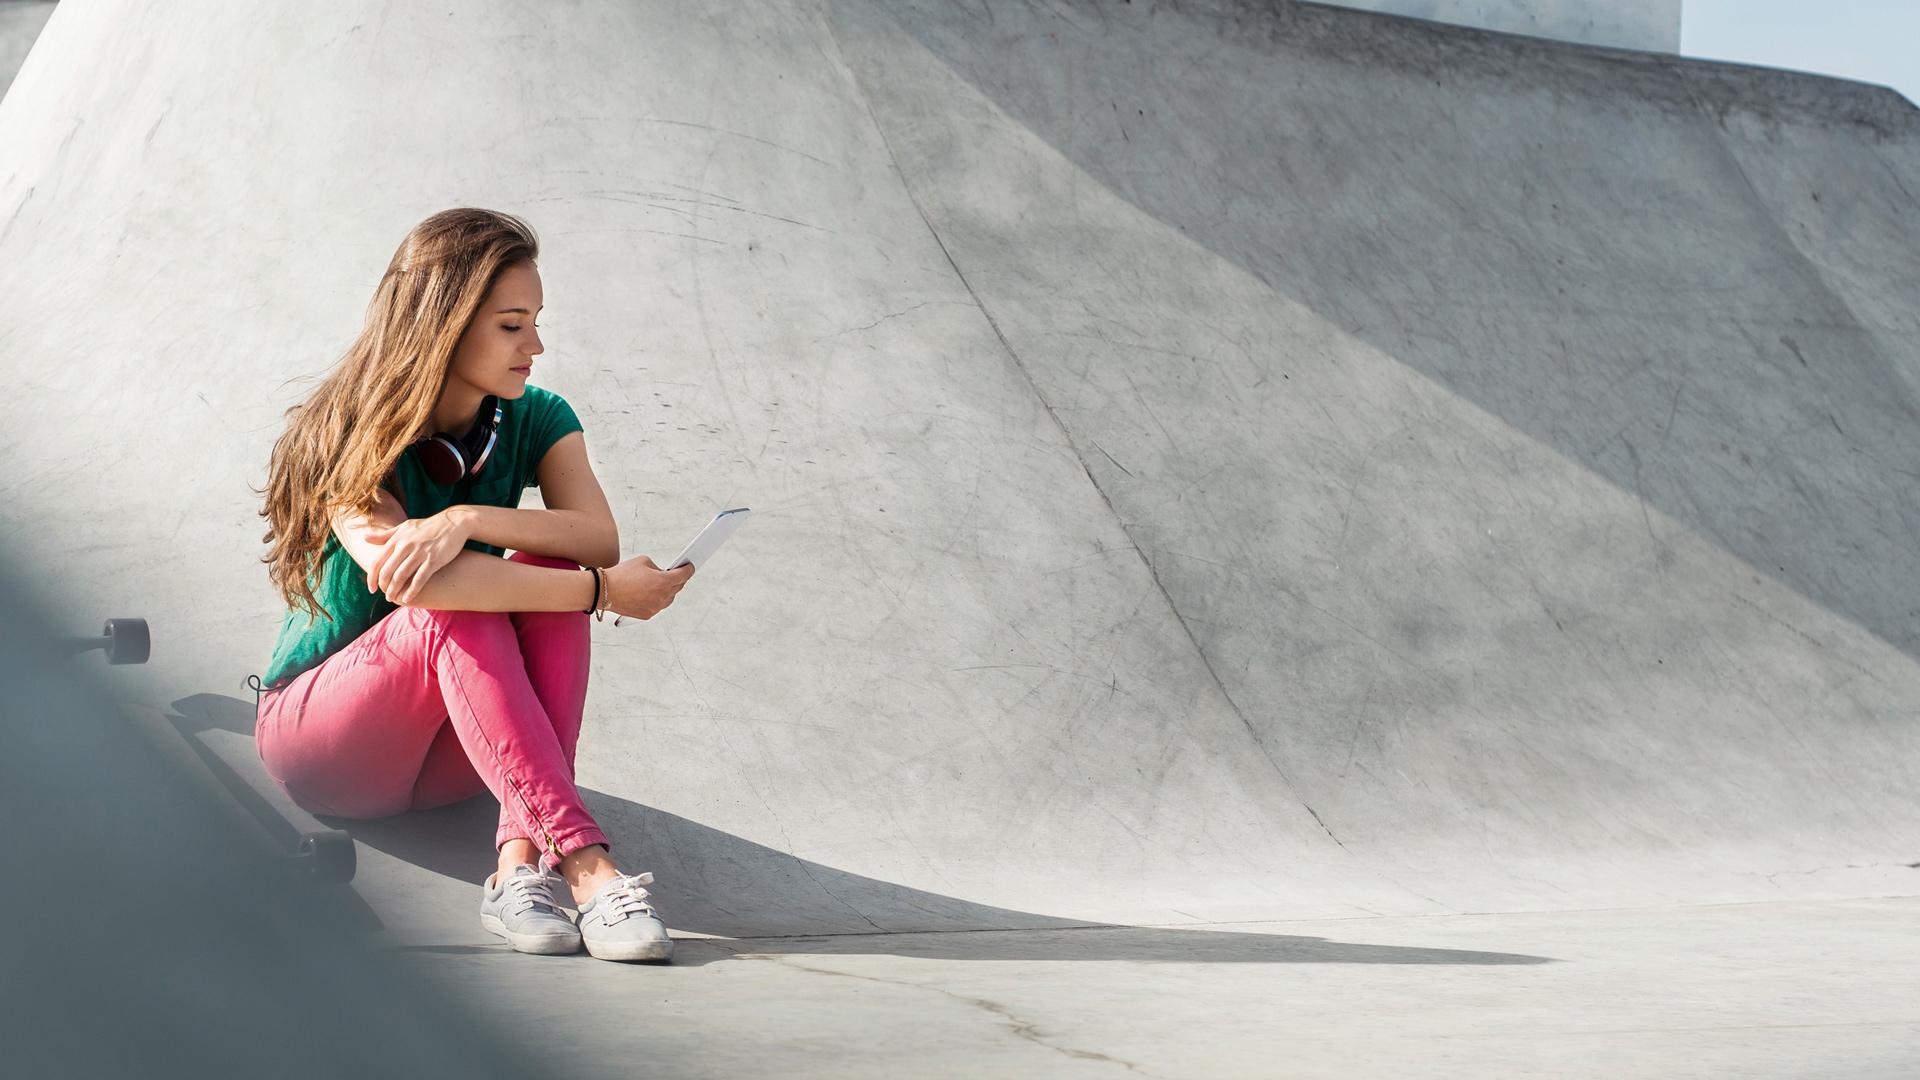 Junge Frau mit Smartphone im Skaterpark.